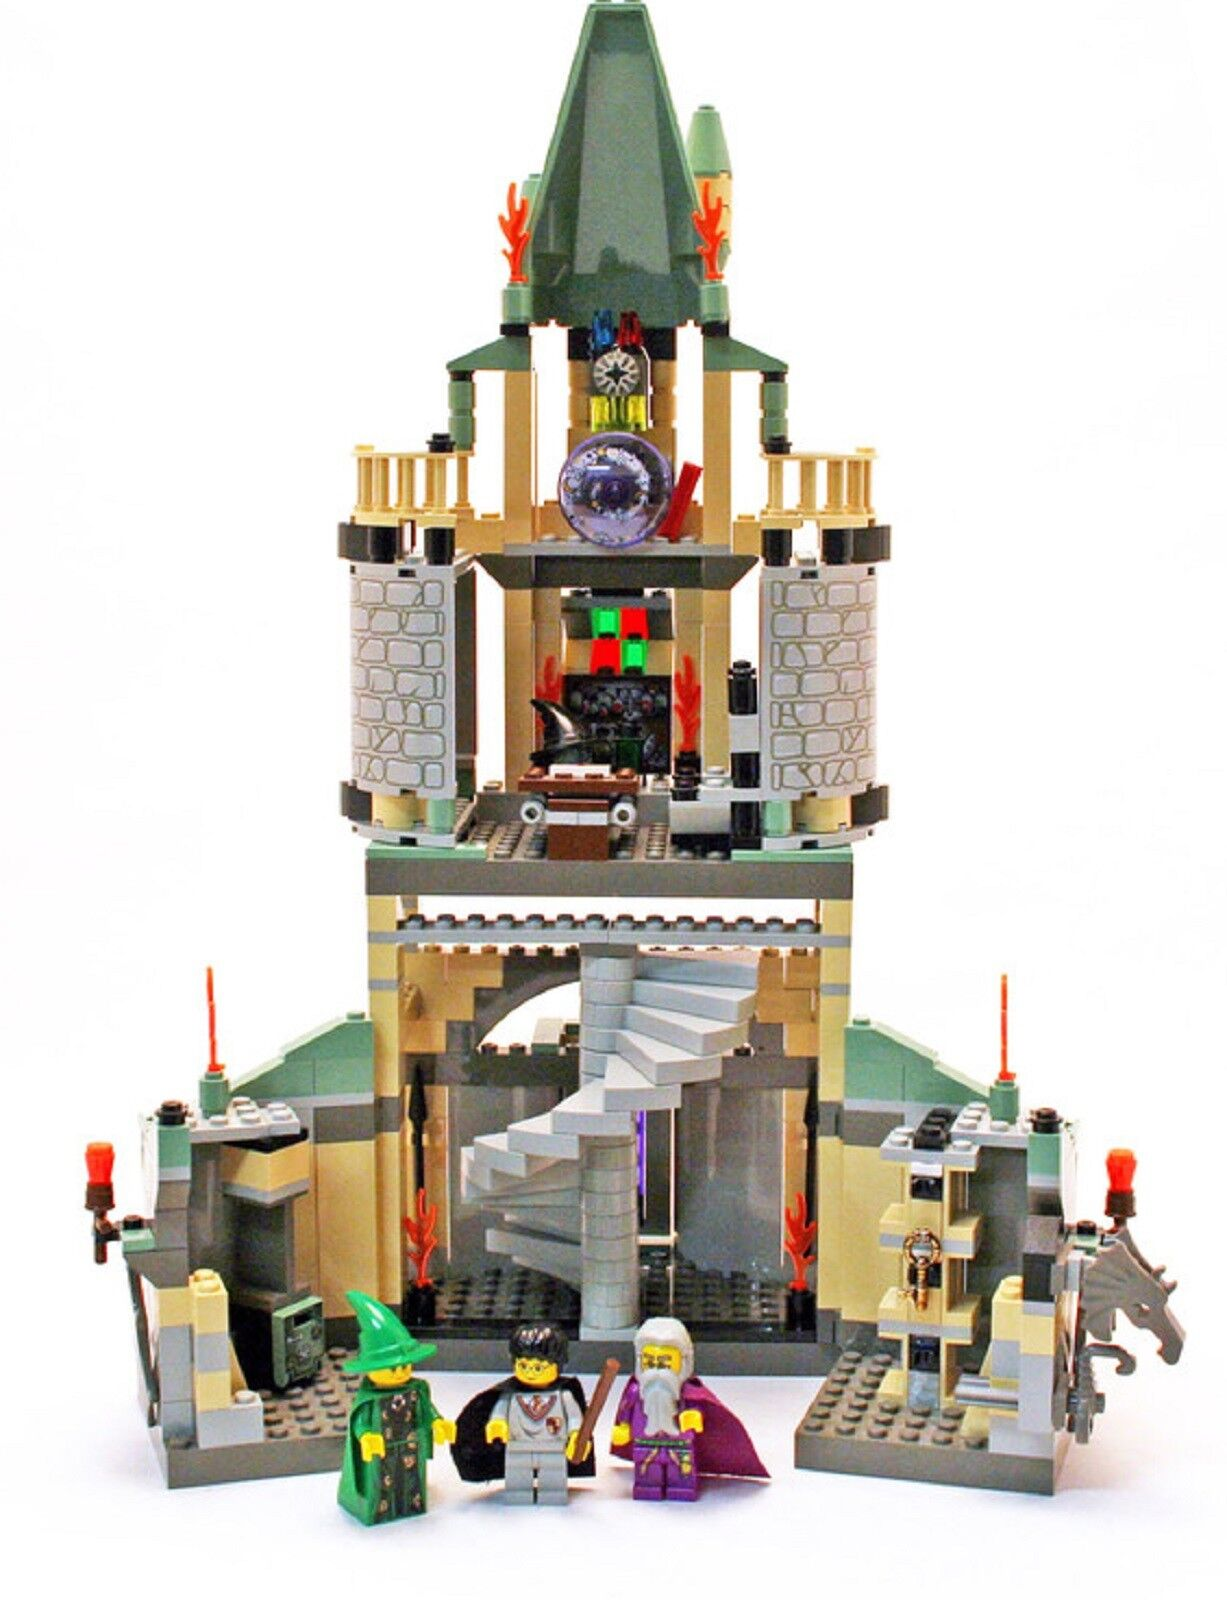 Lego Lego Lego 4729 Harry Potter Dumbledor Office complet à 100 % de 2002 -CG10  más descuento